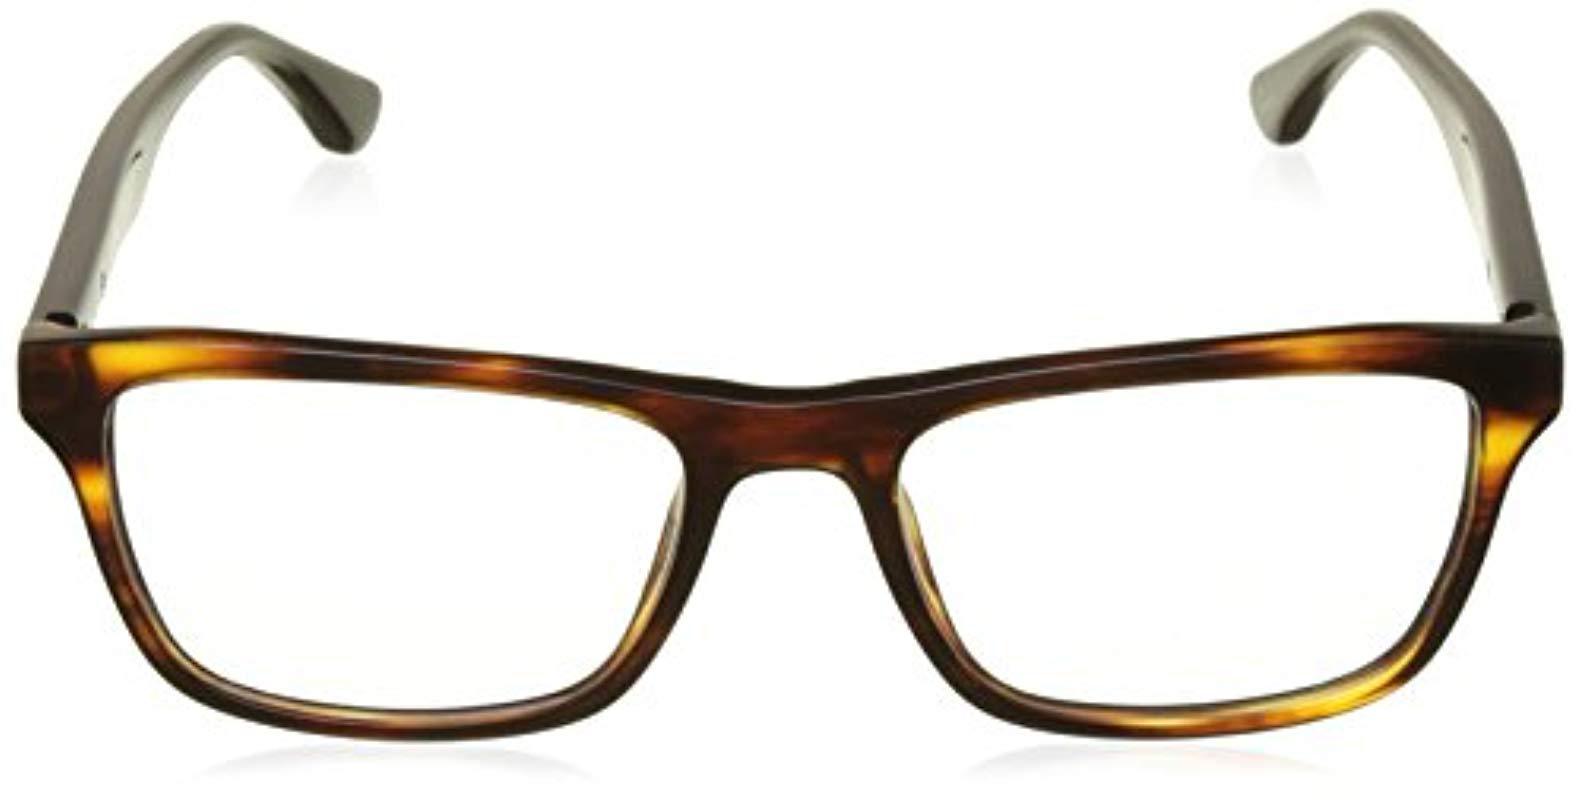 9a5a9e0b7e4 Ray-Ban - 0rx 5279 5691 55 Optical Frames